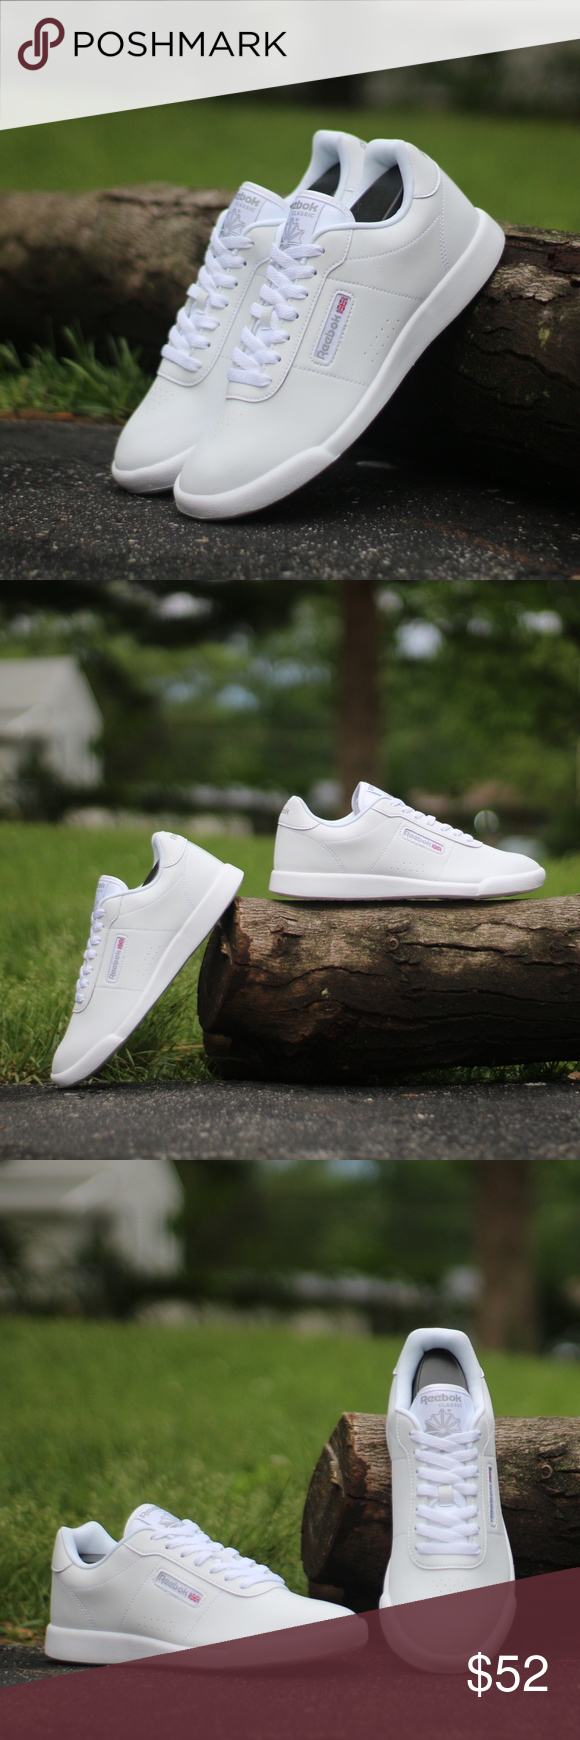 086593a0f8b Reebok Women s Princess Lite Classic Shoe AR1267 Brand New